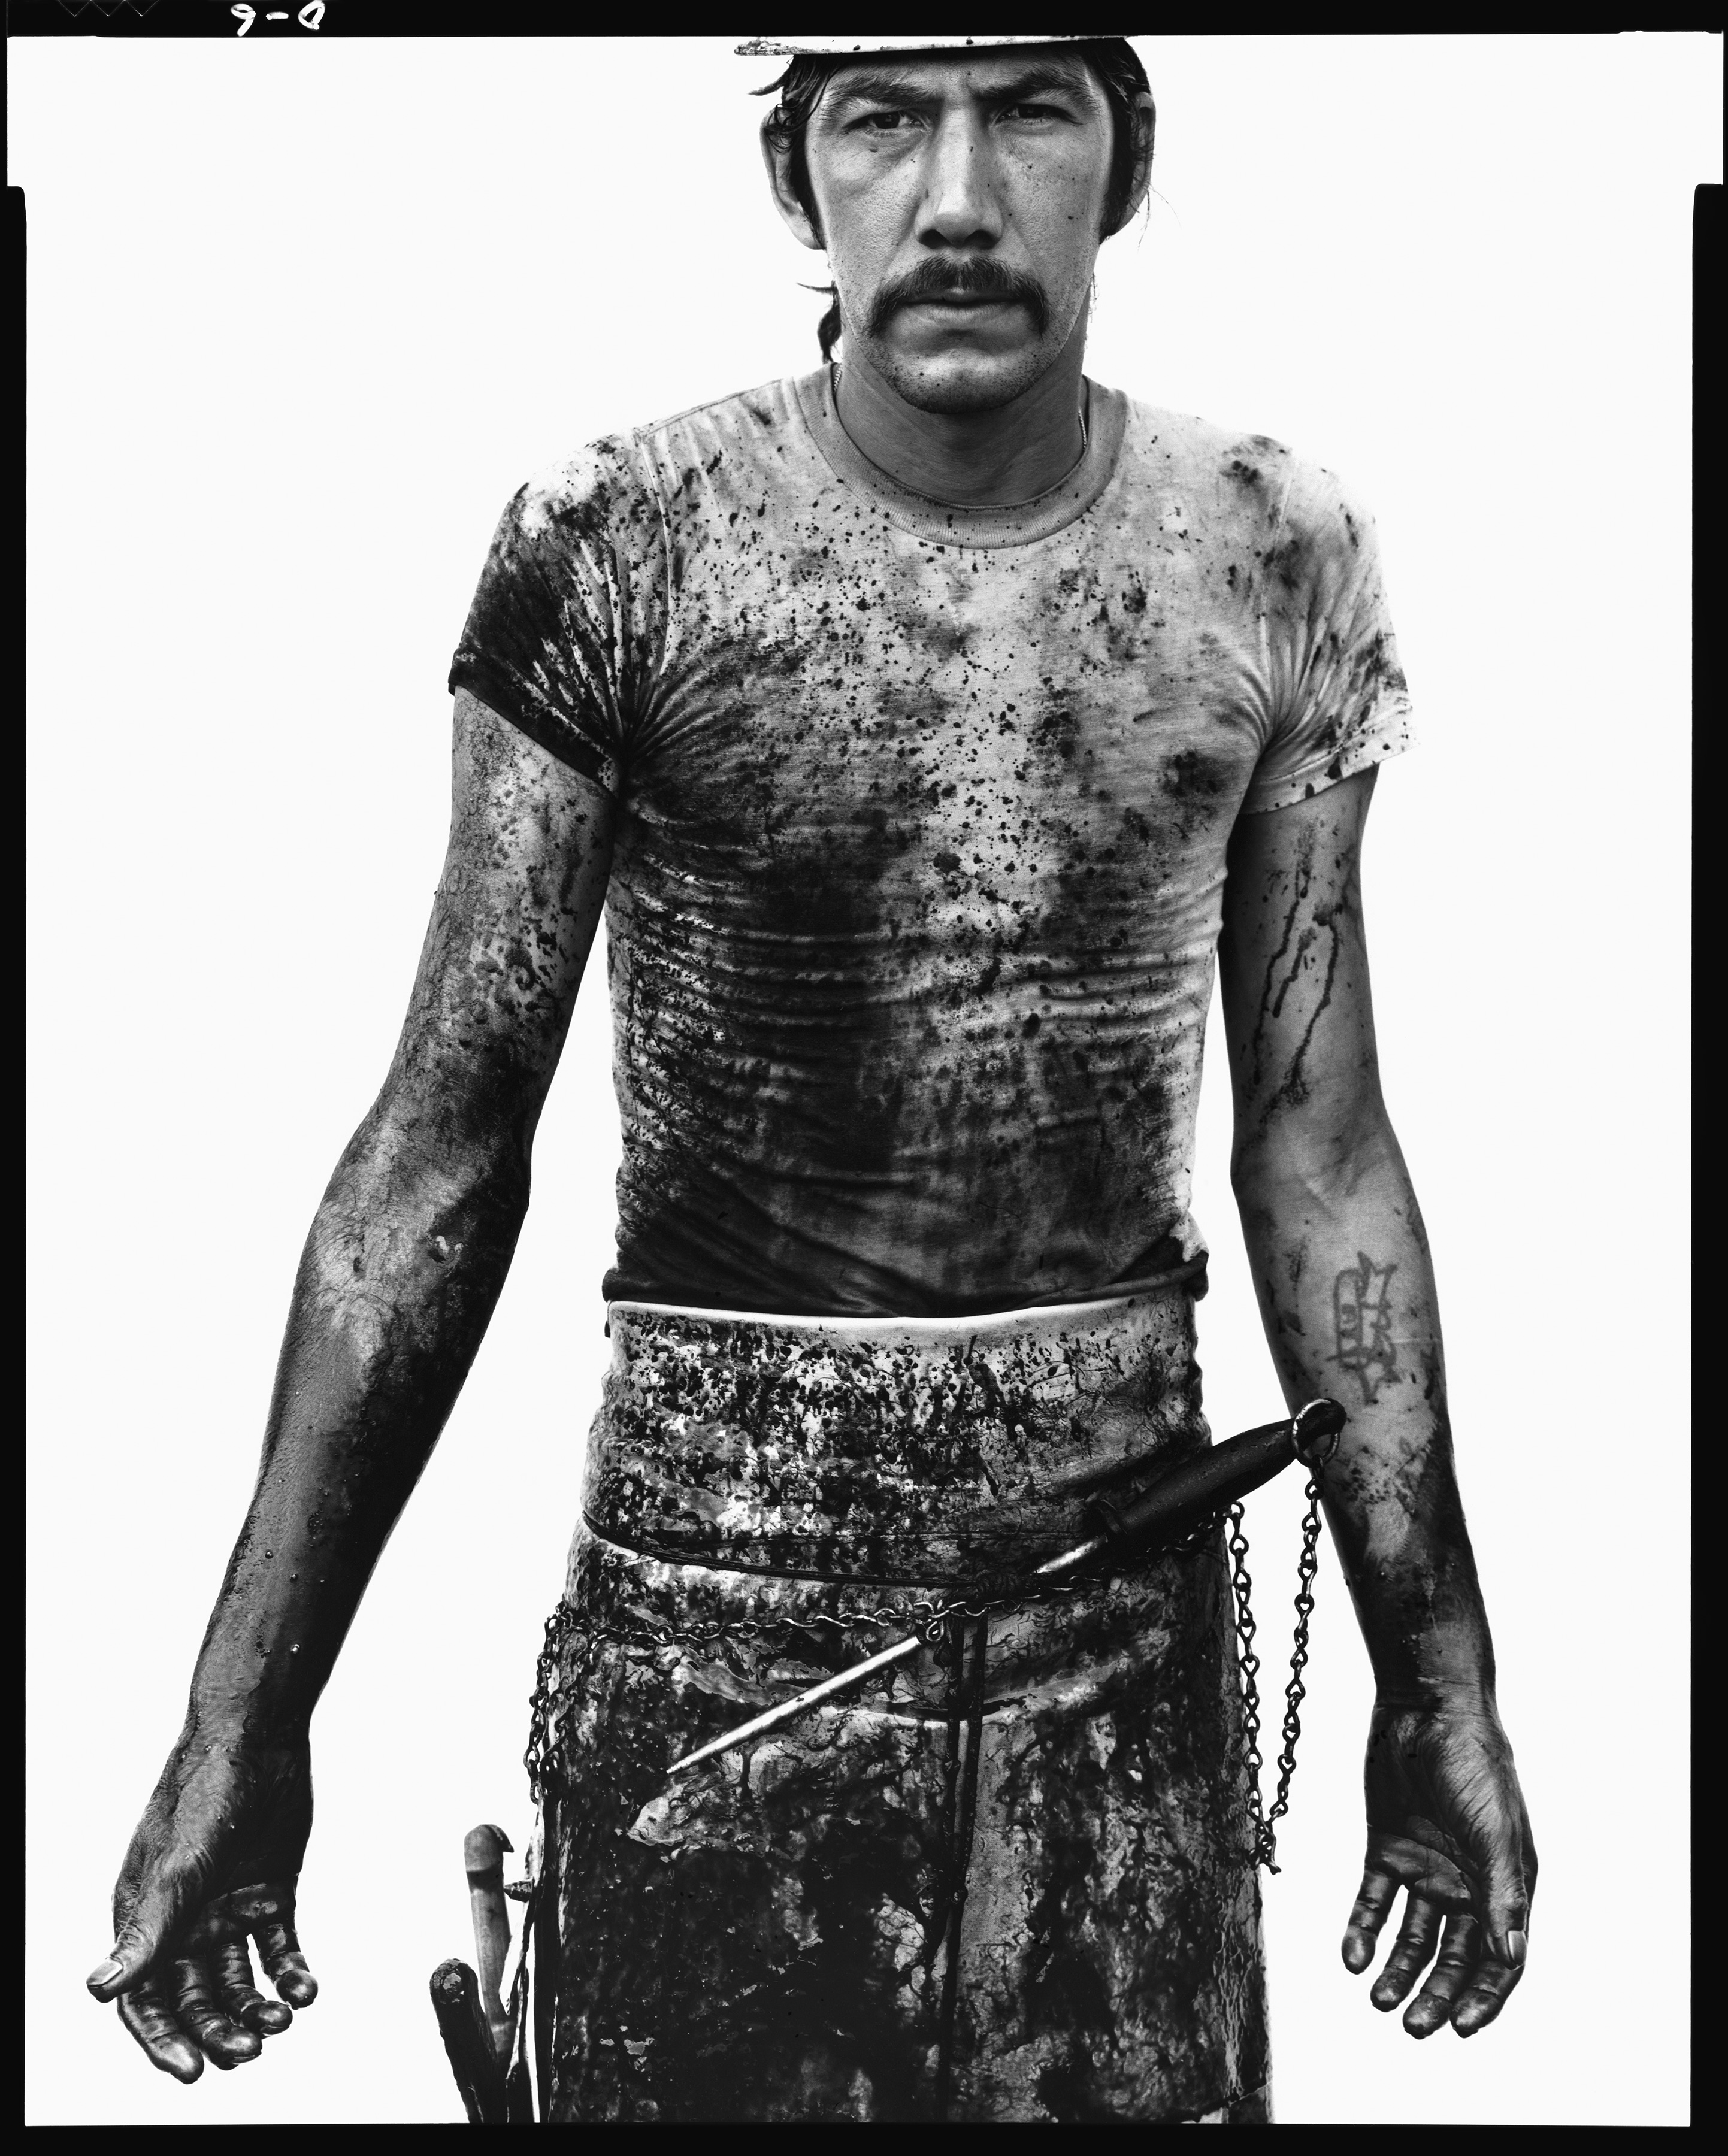 Blue Cloud (Larry) Wright, slaughterhouse worker, Omaha, Nebraska, August 10, 1979, by Richard Avedon